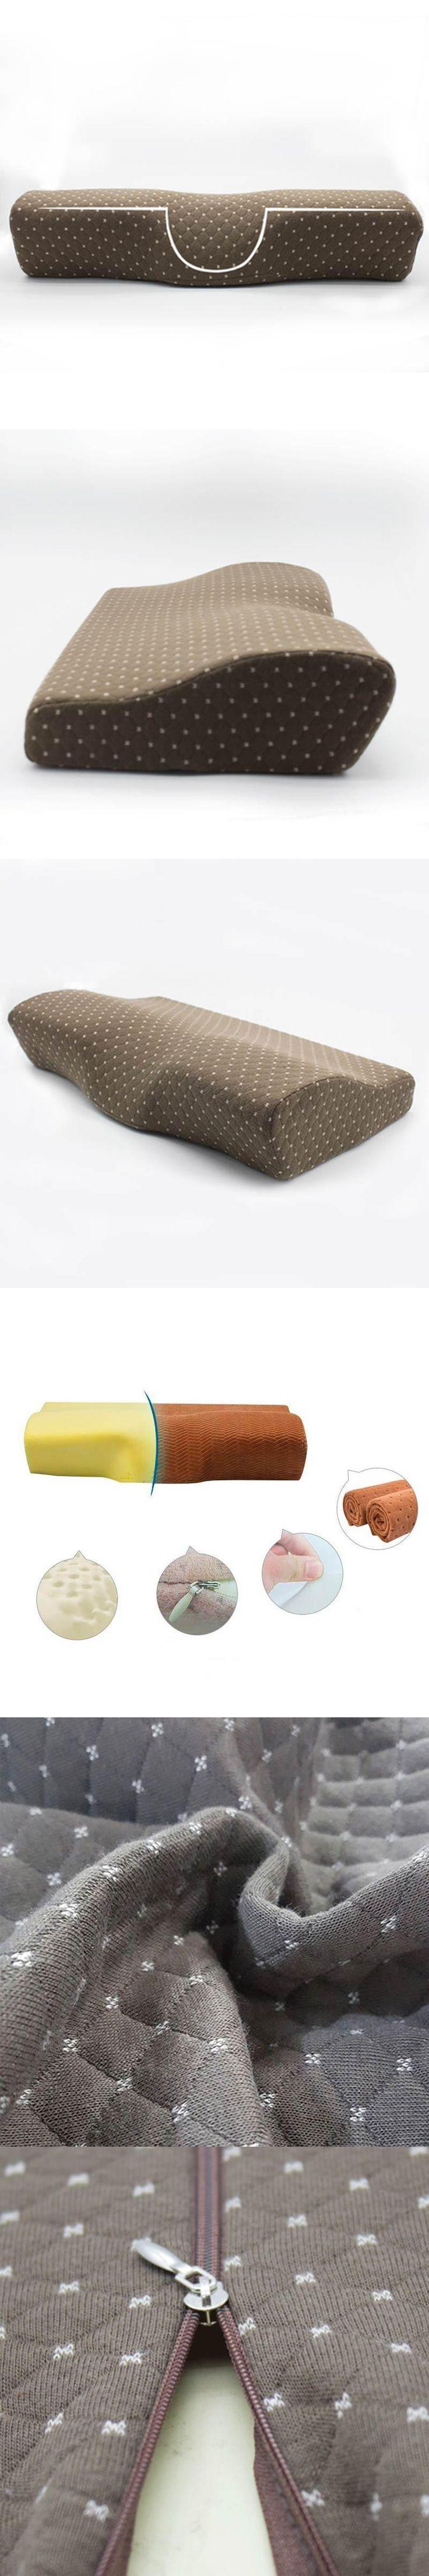 Care Orthopedic Pillow Latex Neck Massager Pillow Slow Rebound Memory Foam Head Cervical Health Sleeping Pillow travesseiro